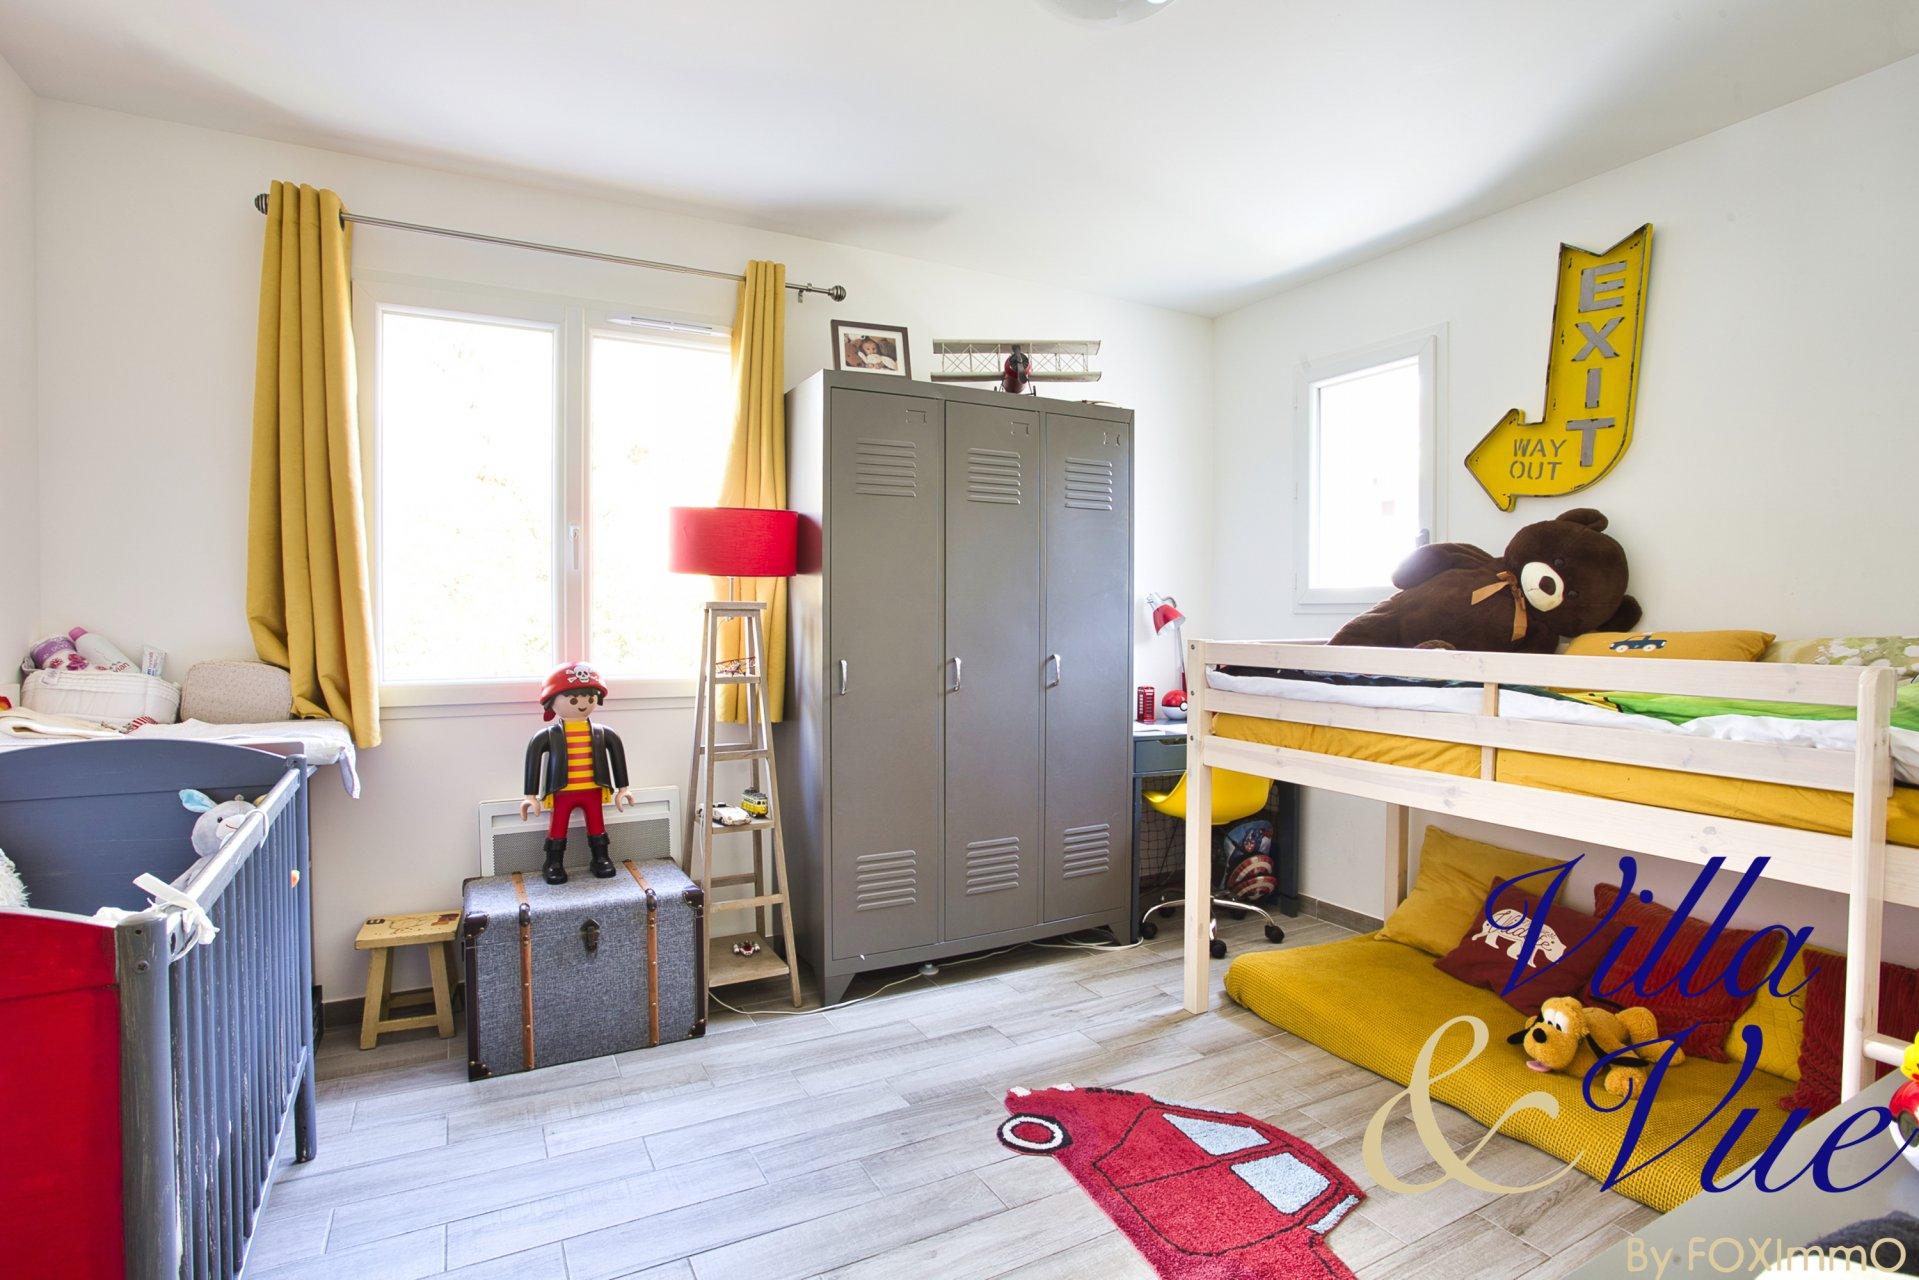 Costa Azzurra, Villeneuve Loubet Nuova casa in una zona tranquilla